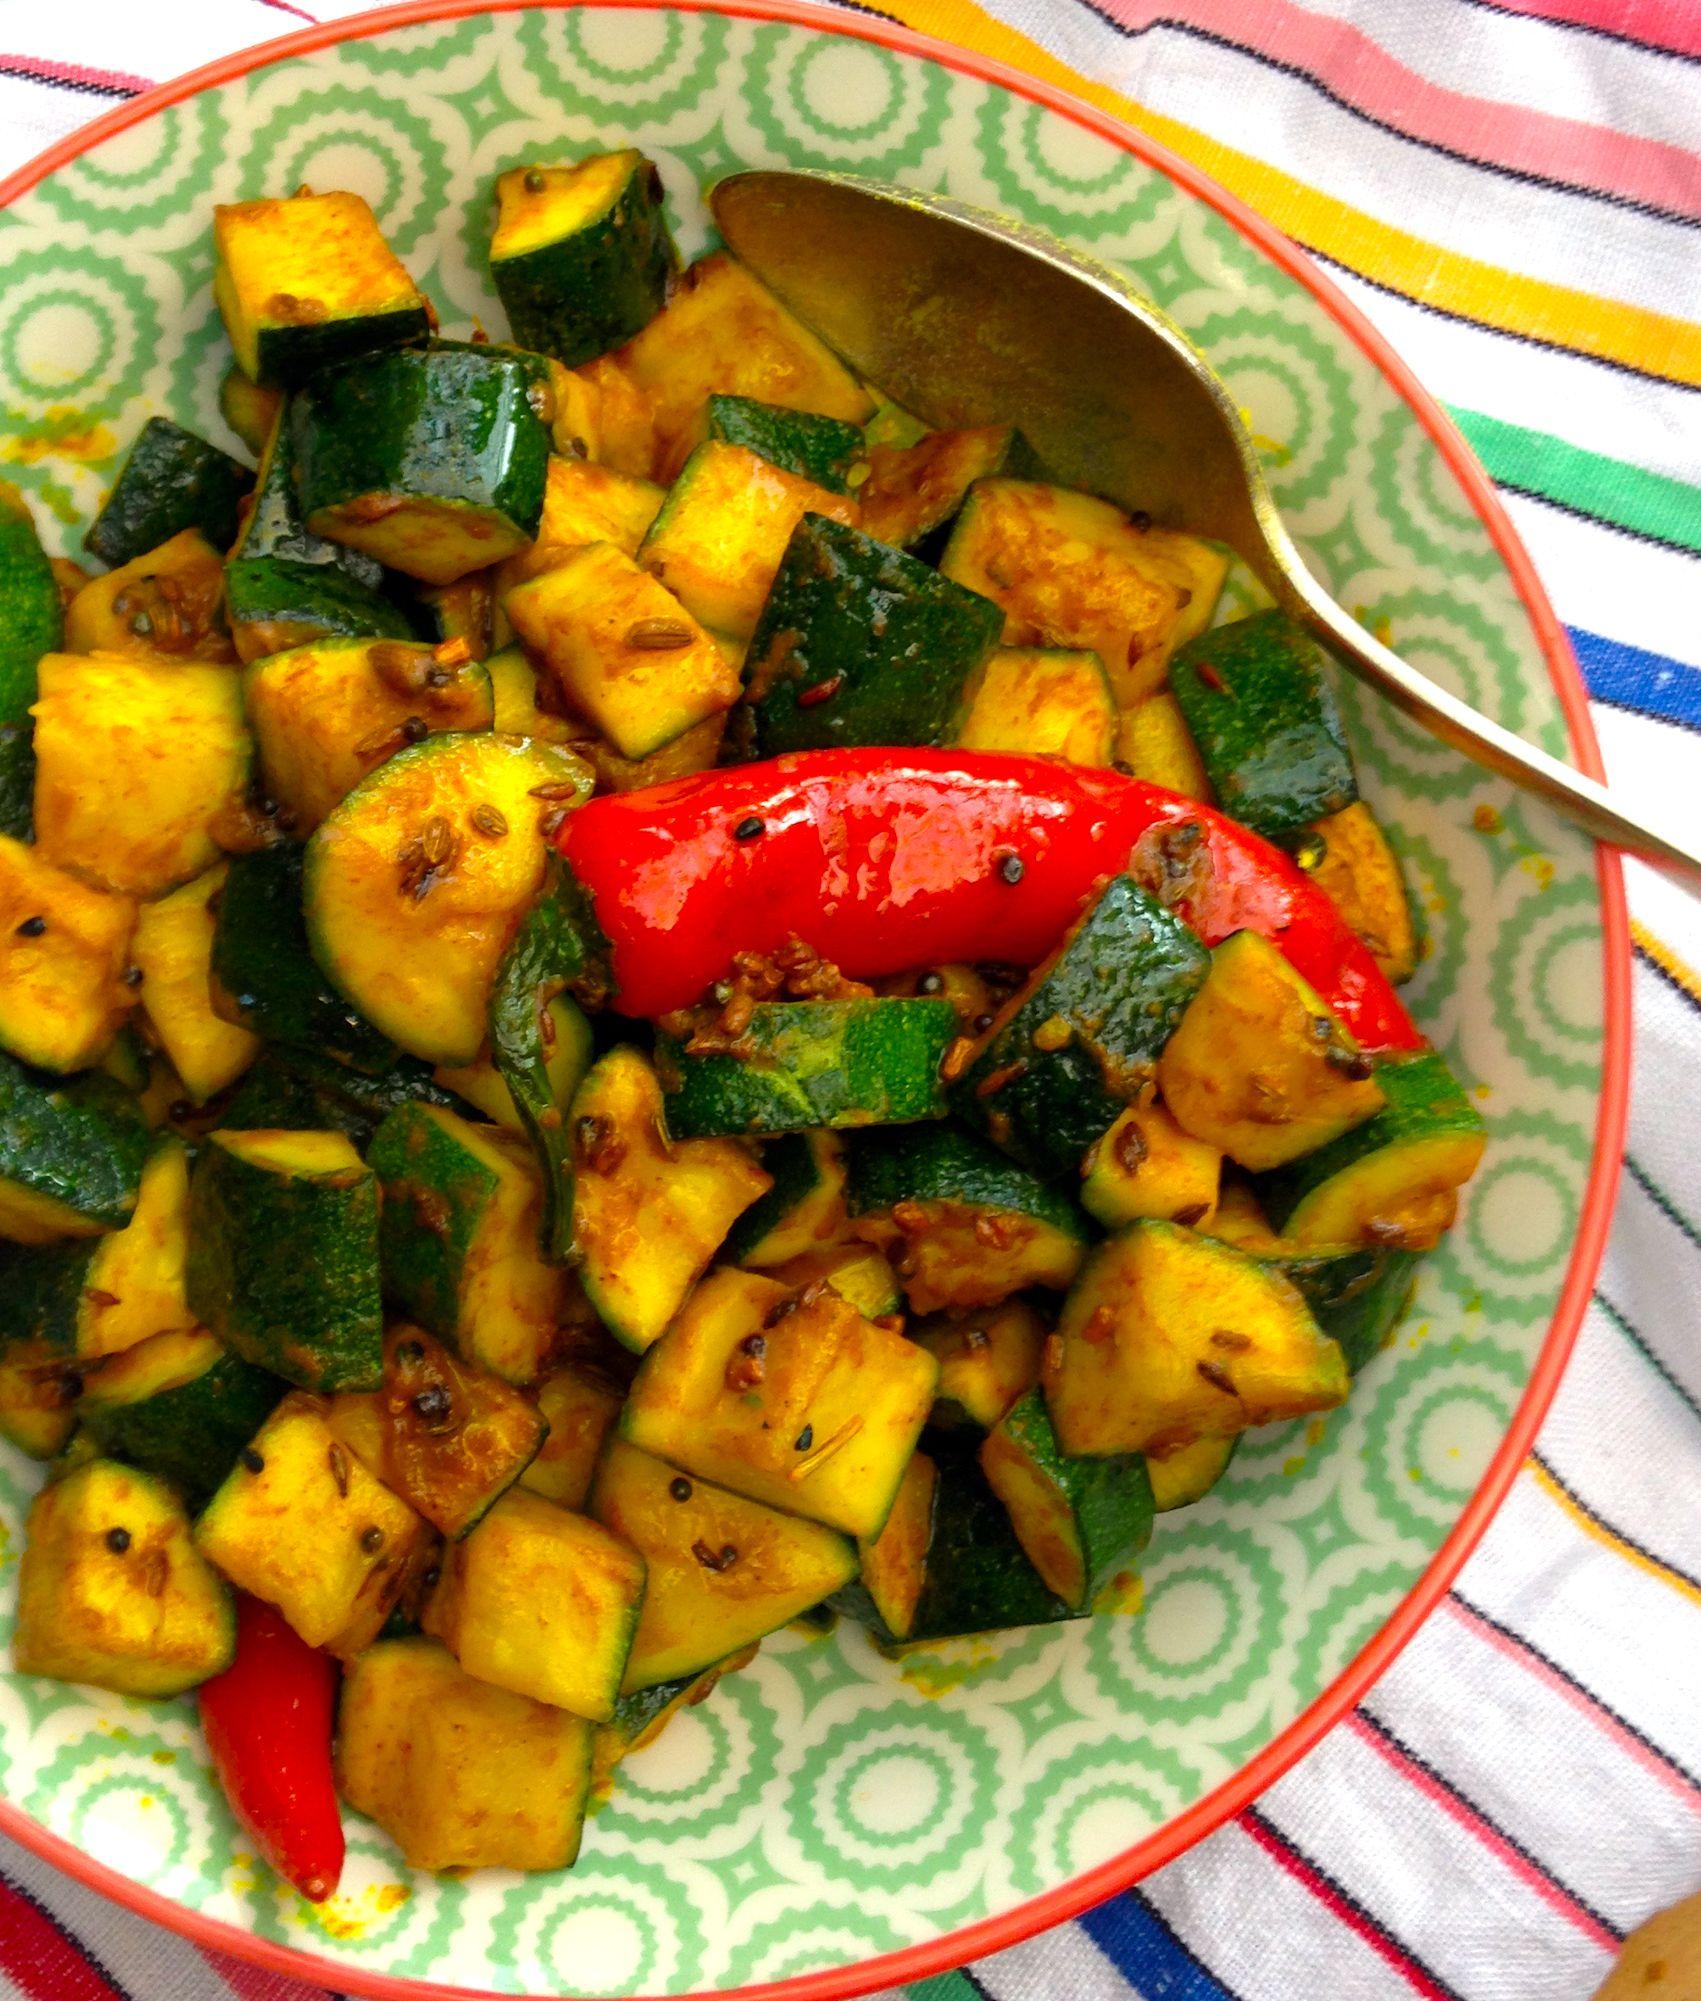 Bengali Style Zucchini Sabzi Zucchini Recipes Indian Indian Food Recipes Indian Side Dishes